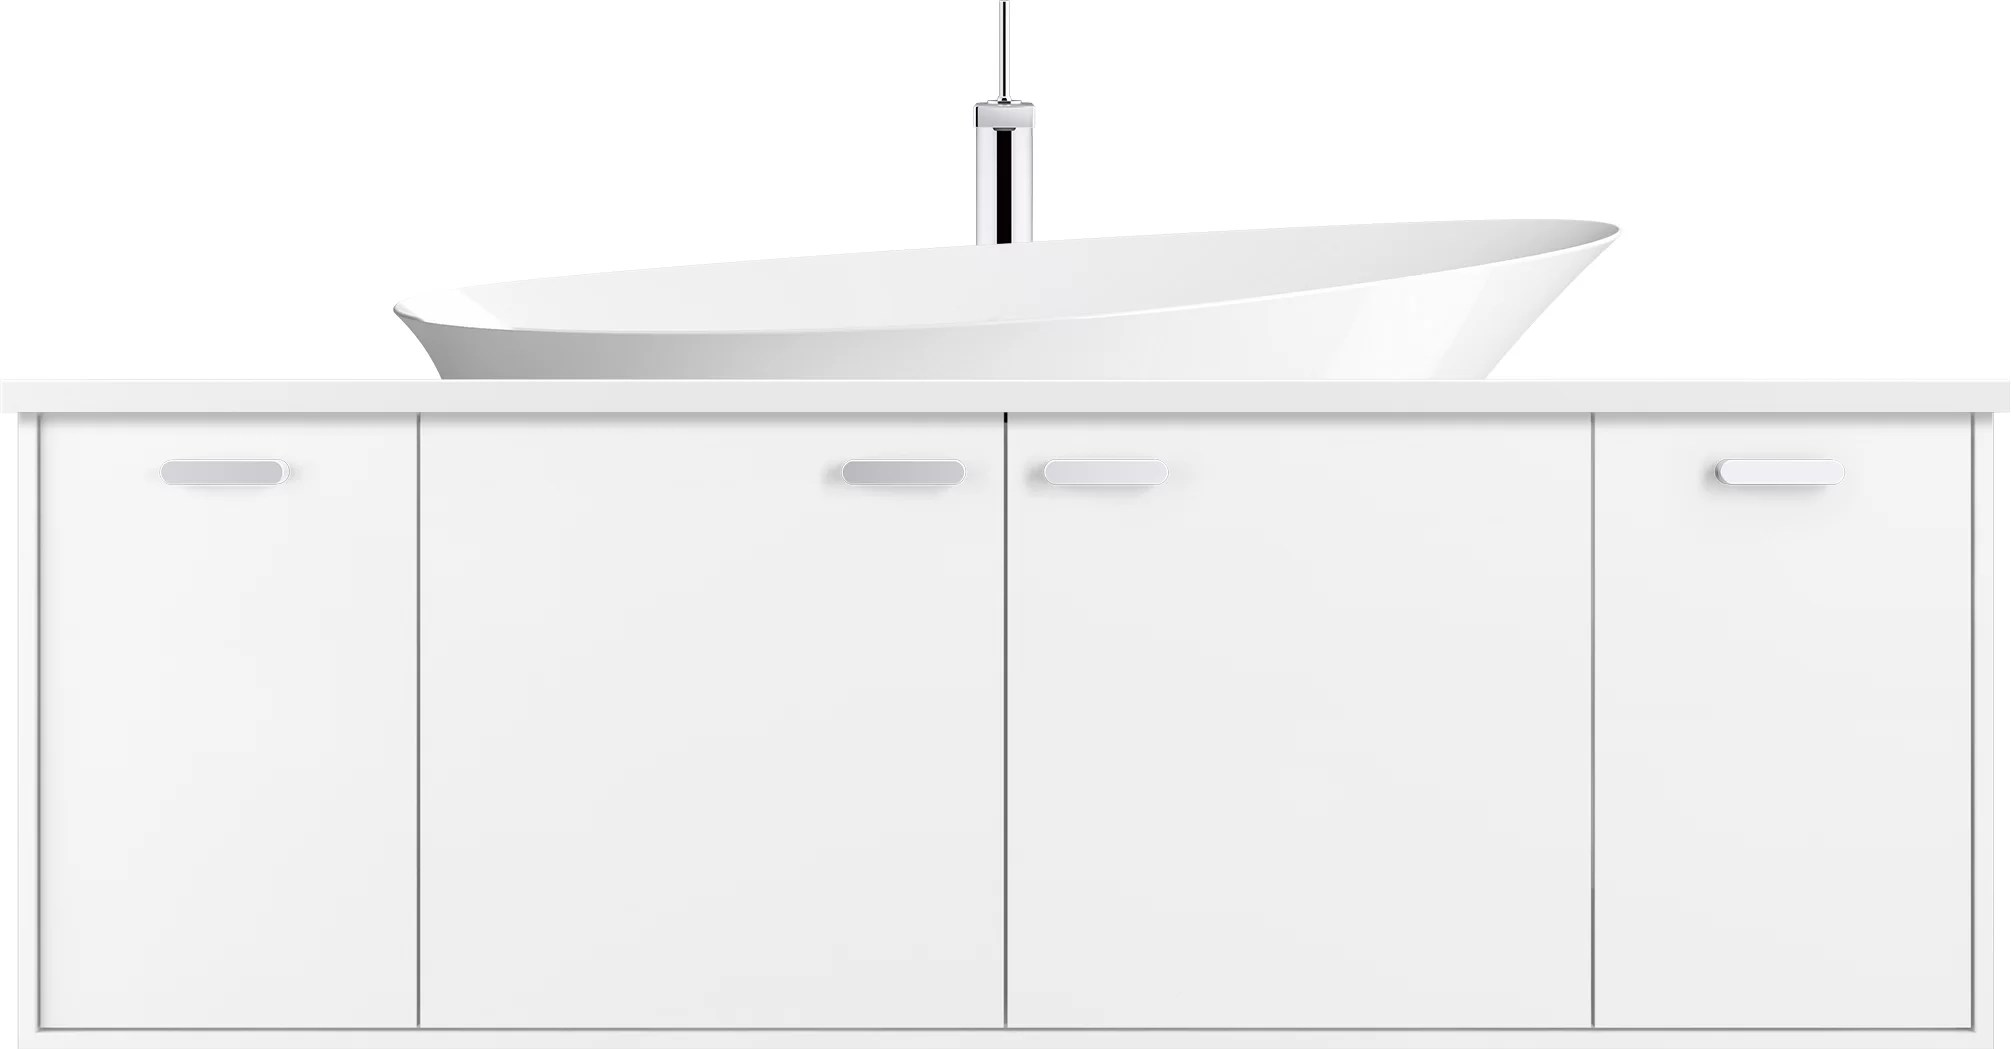 kohler composed tall single handle bathroom sink faucet with joystick handle